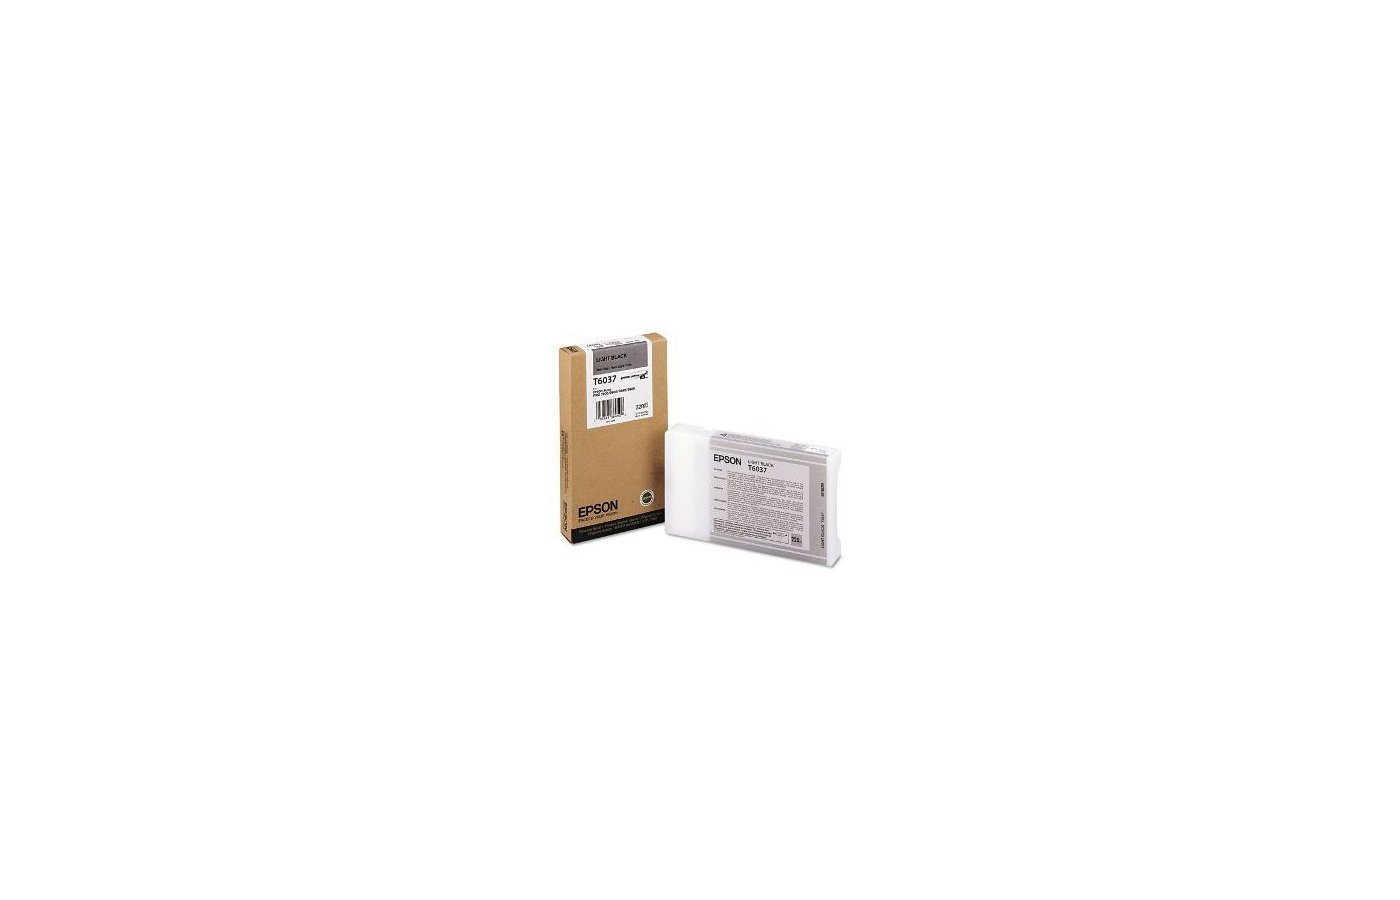 Картридж струйный Epson C13T603700 картридж (Light Black для Stylus PRO 7800/7880/9800/9880 (220ml) (серый))